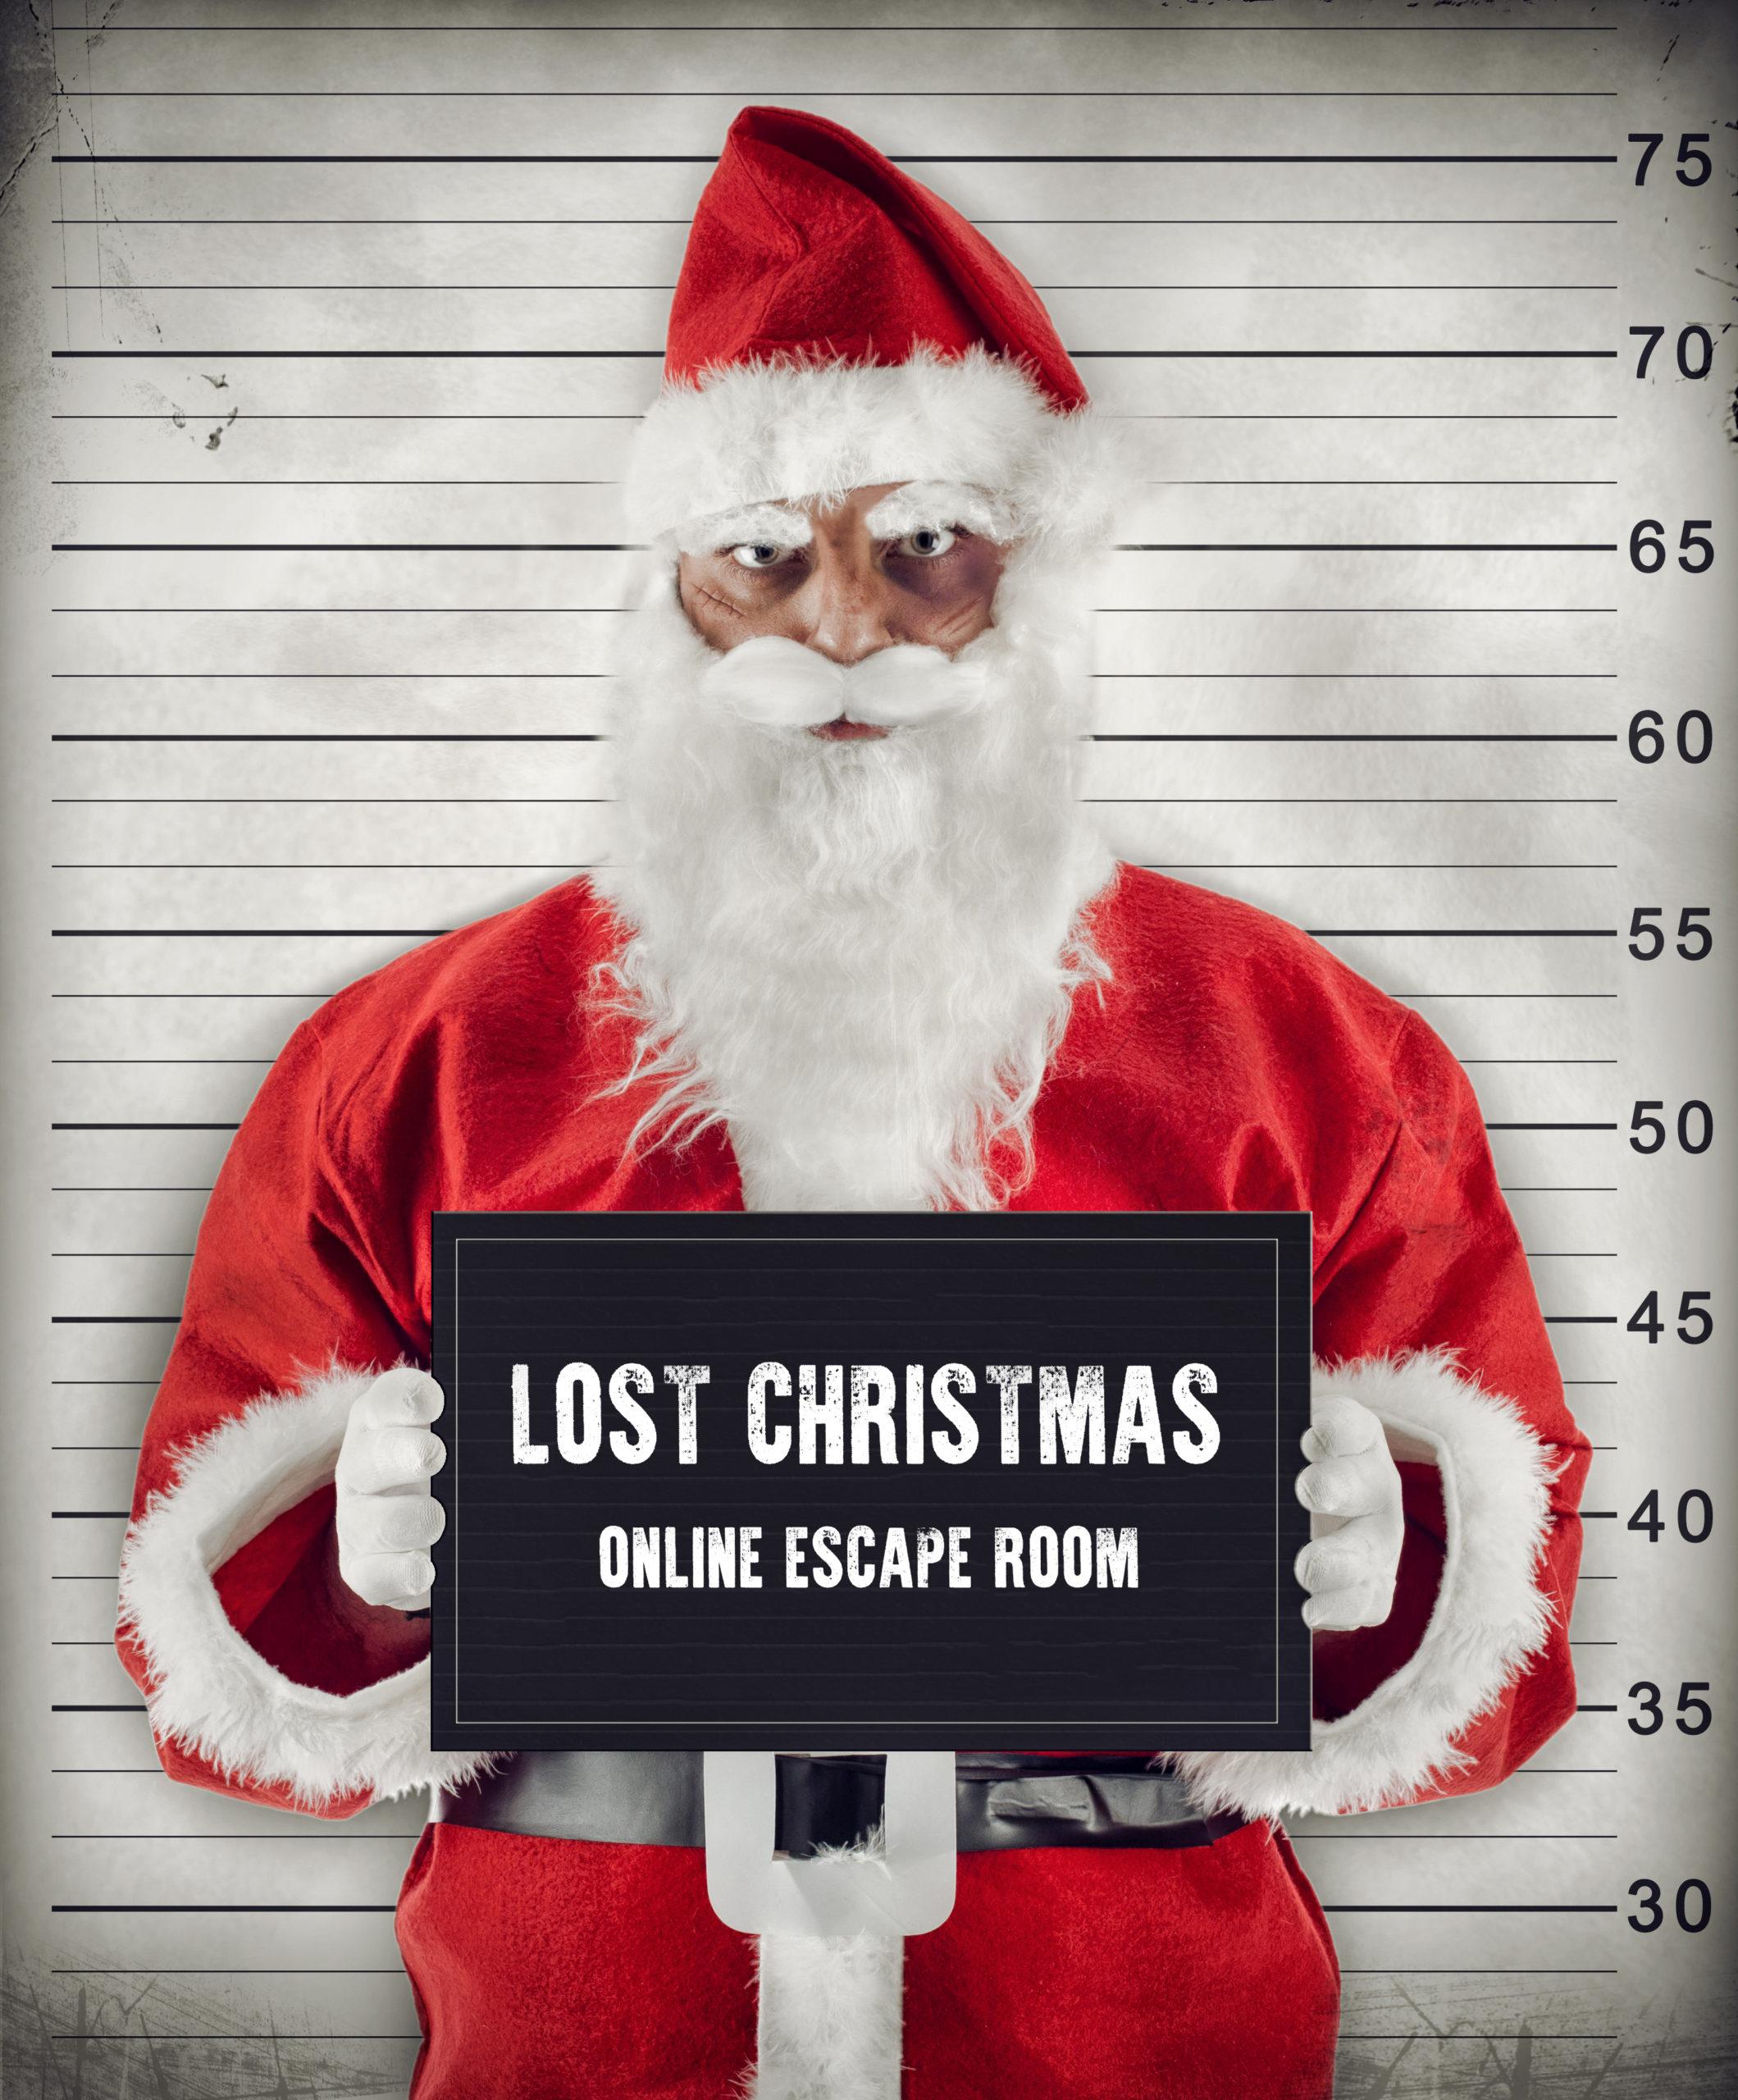 EscapeWorld Stuttgart Lostchristmas01